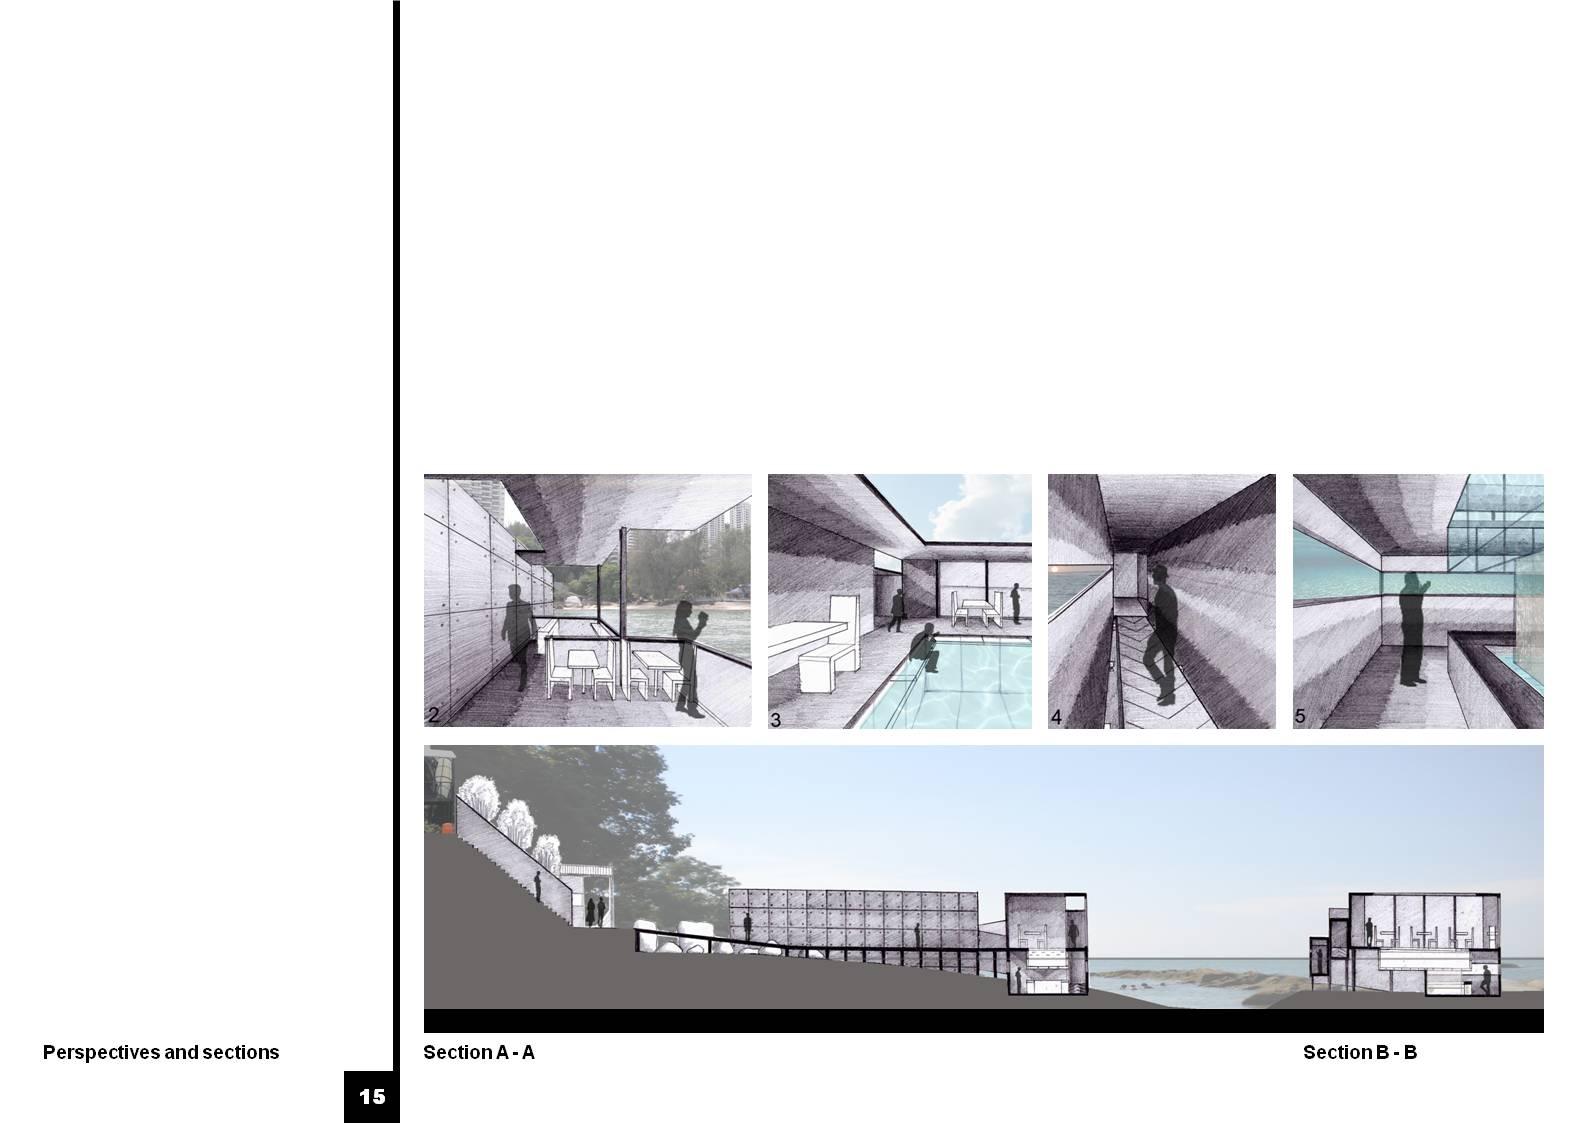 Architecture design 301 portfolio my blog city by for Architecture portfolio dimensions